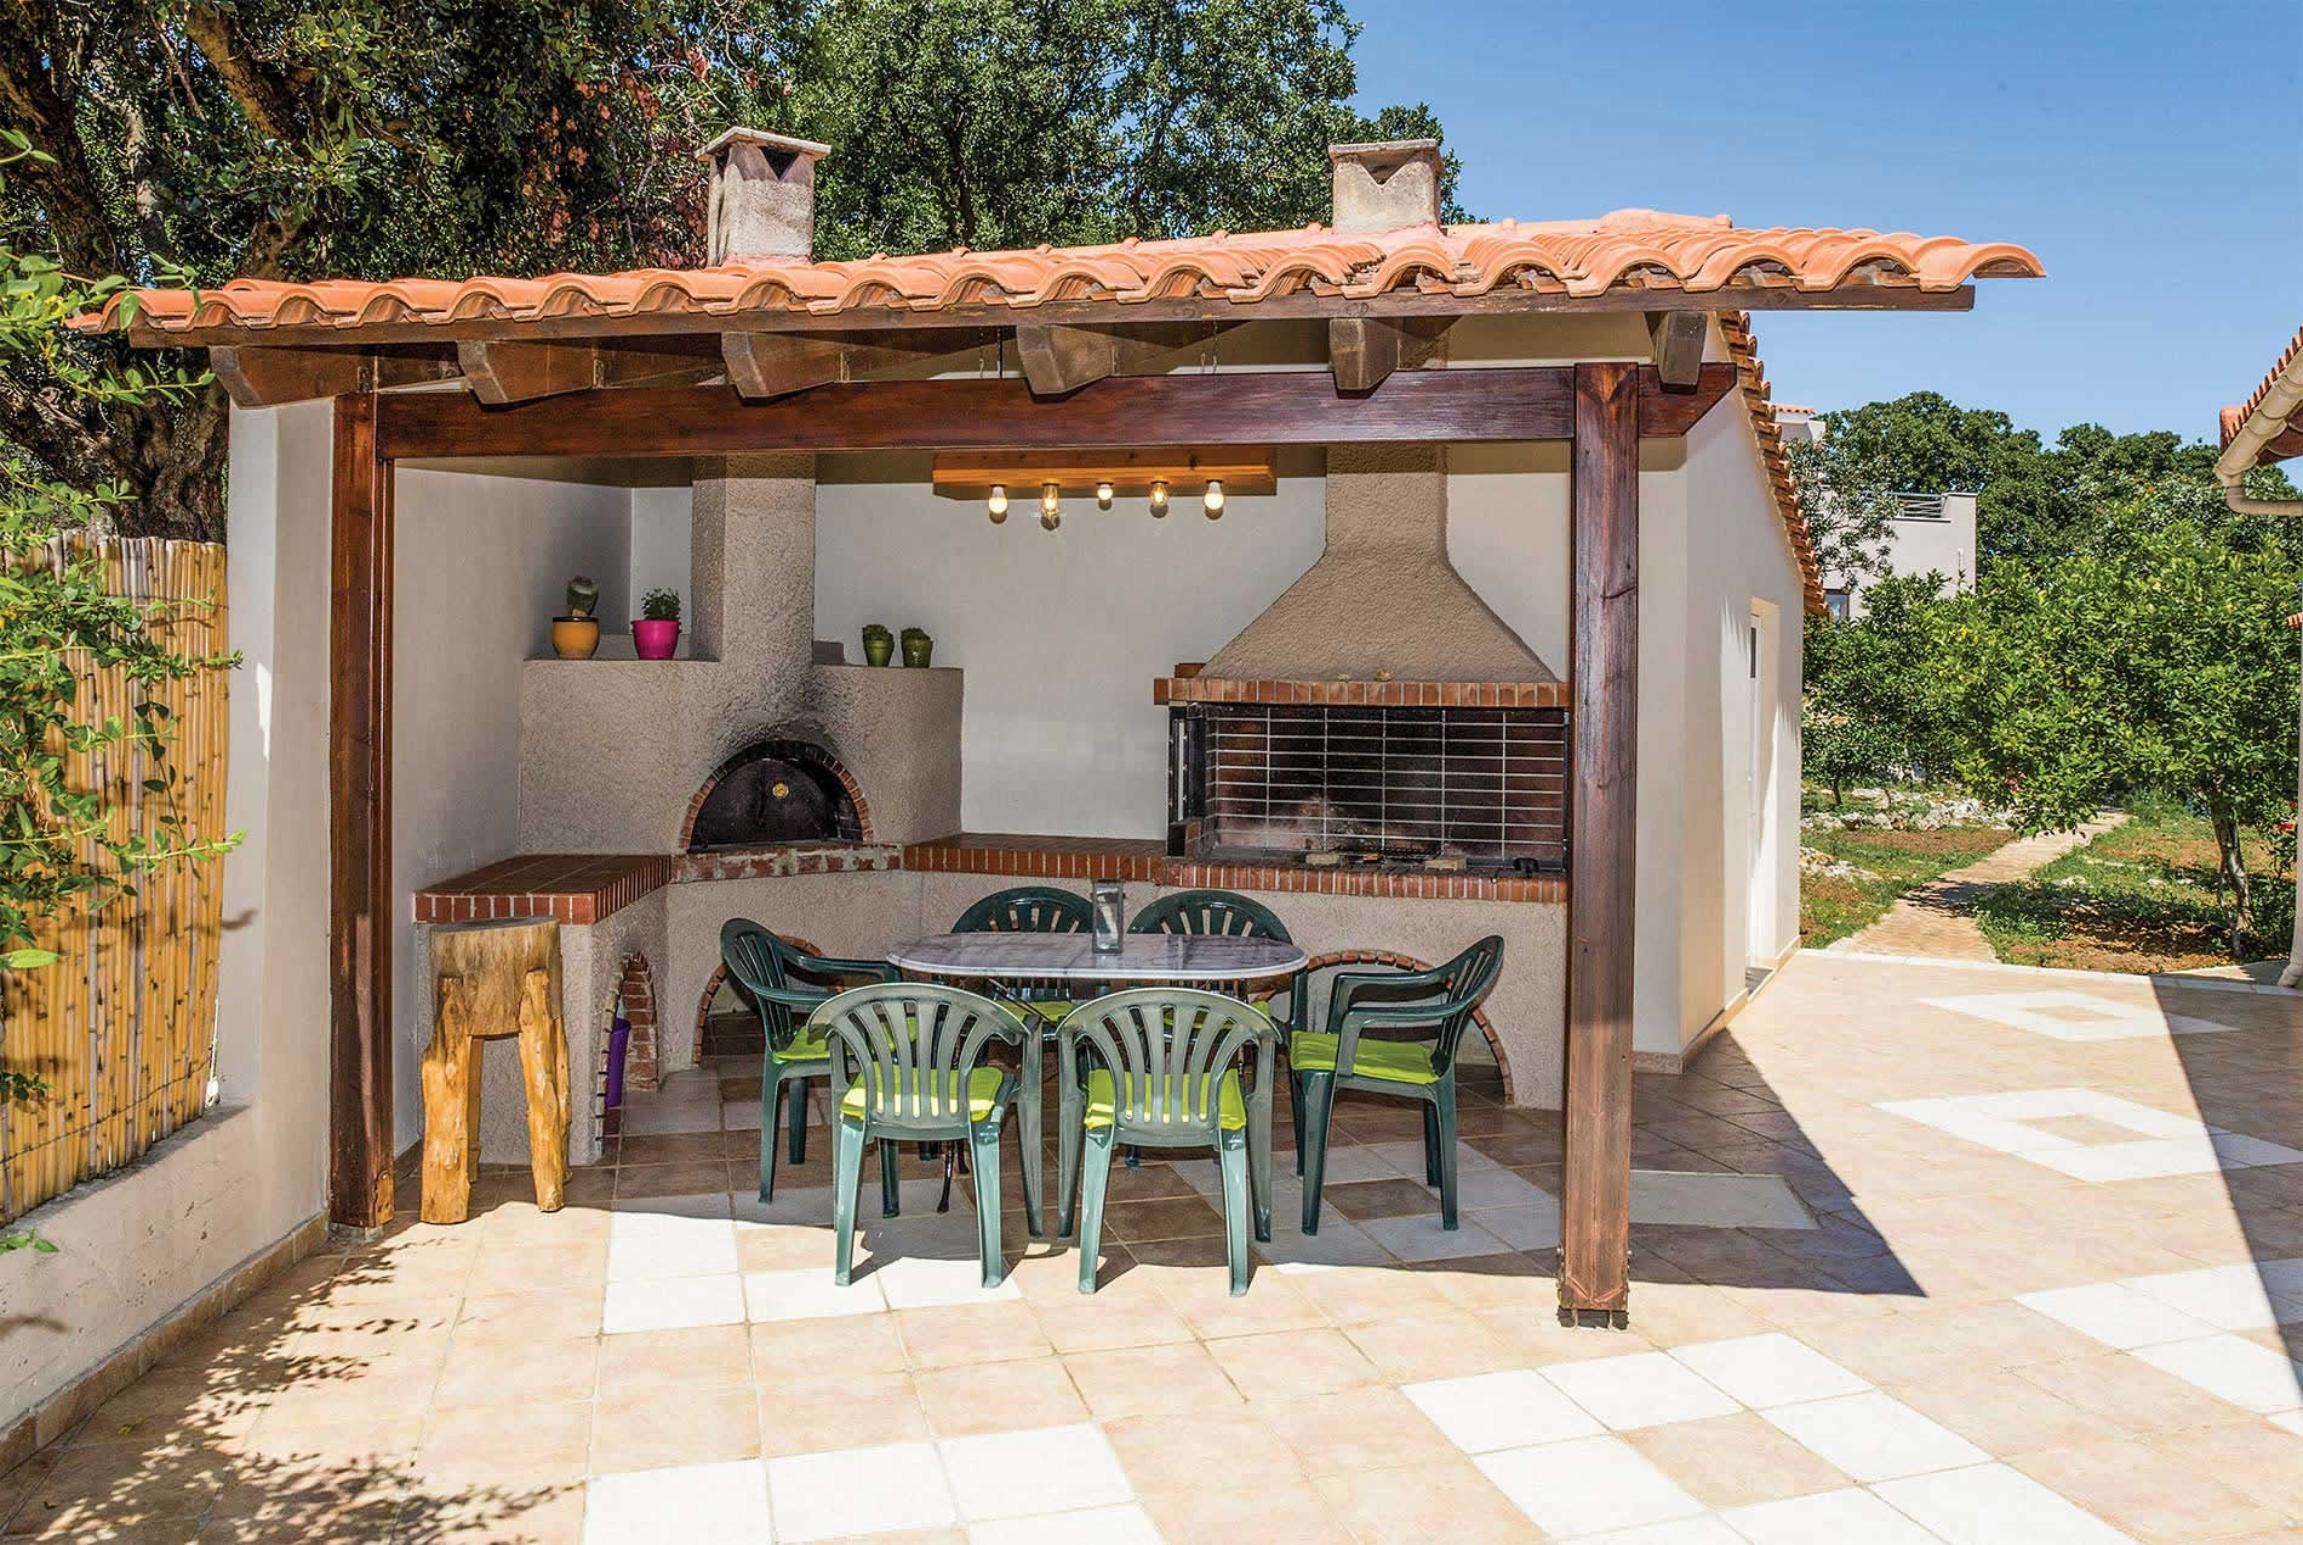 Ferienhaus Filia (2654231), Rethymno, Kreta Nordküste, Kreta, Griechenland, Bild 8